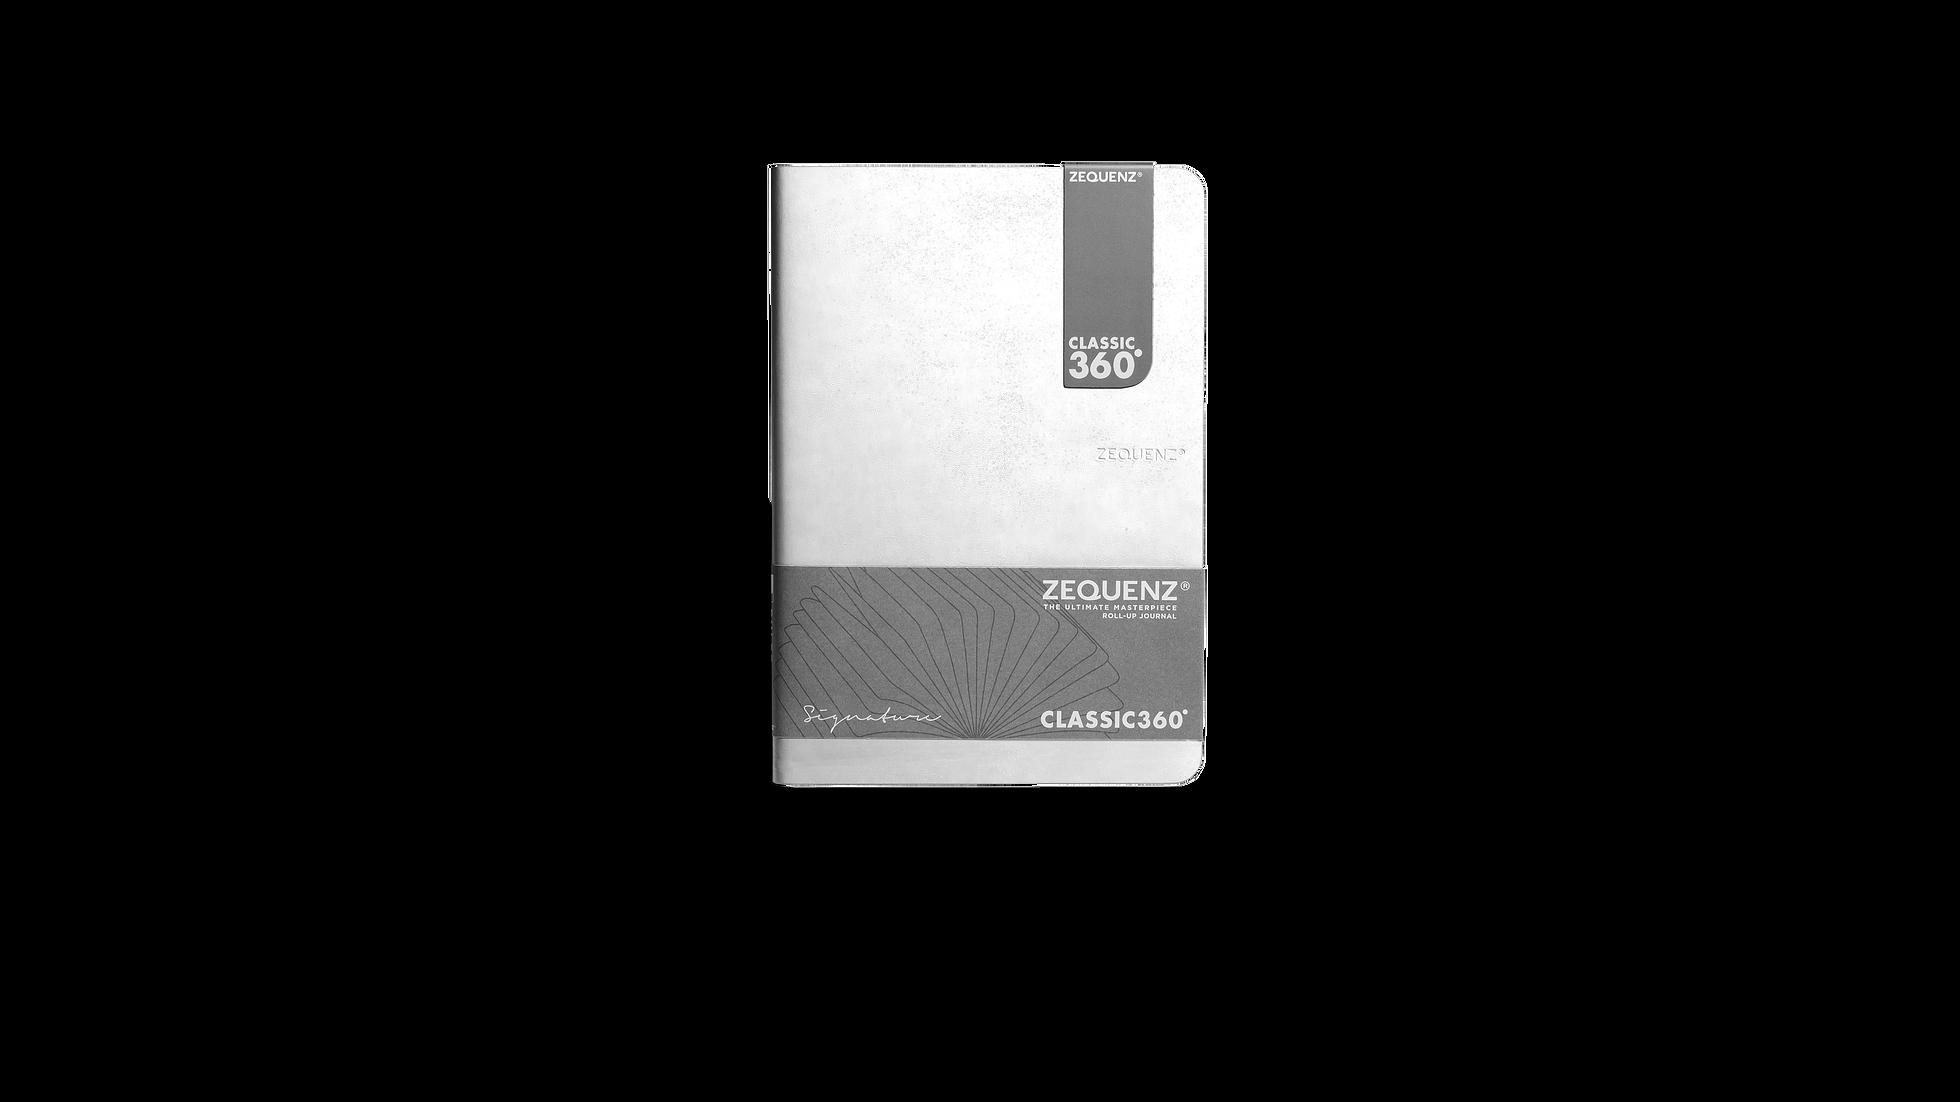 ZEQUENZ 360  可摺疊方眼筆記本(B6)(白色)